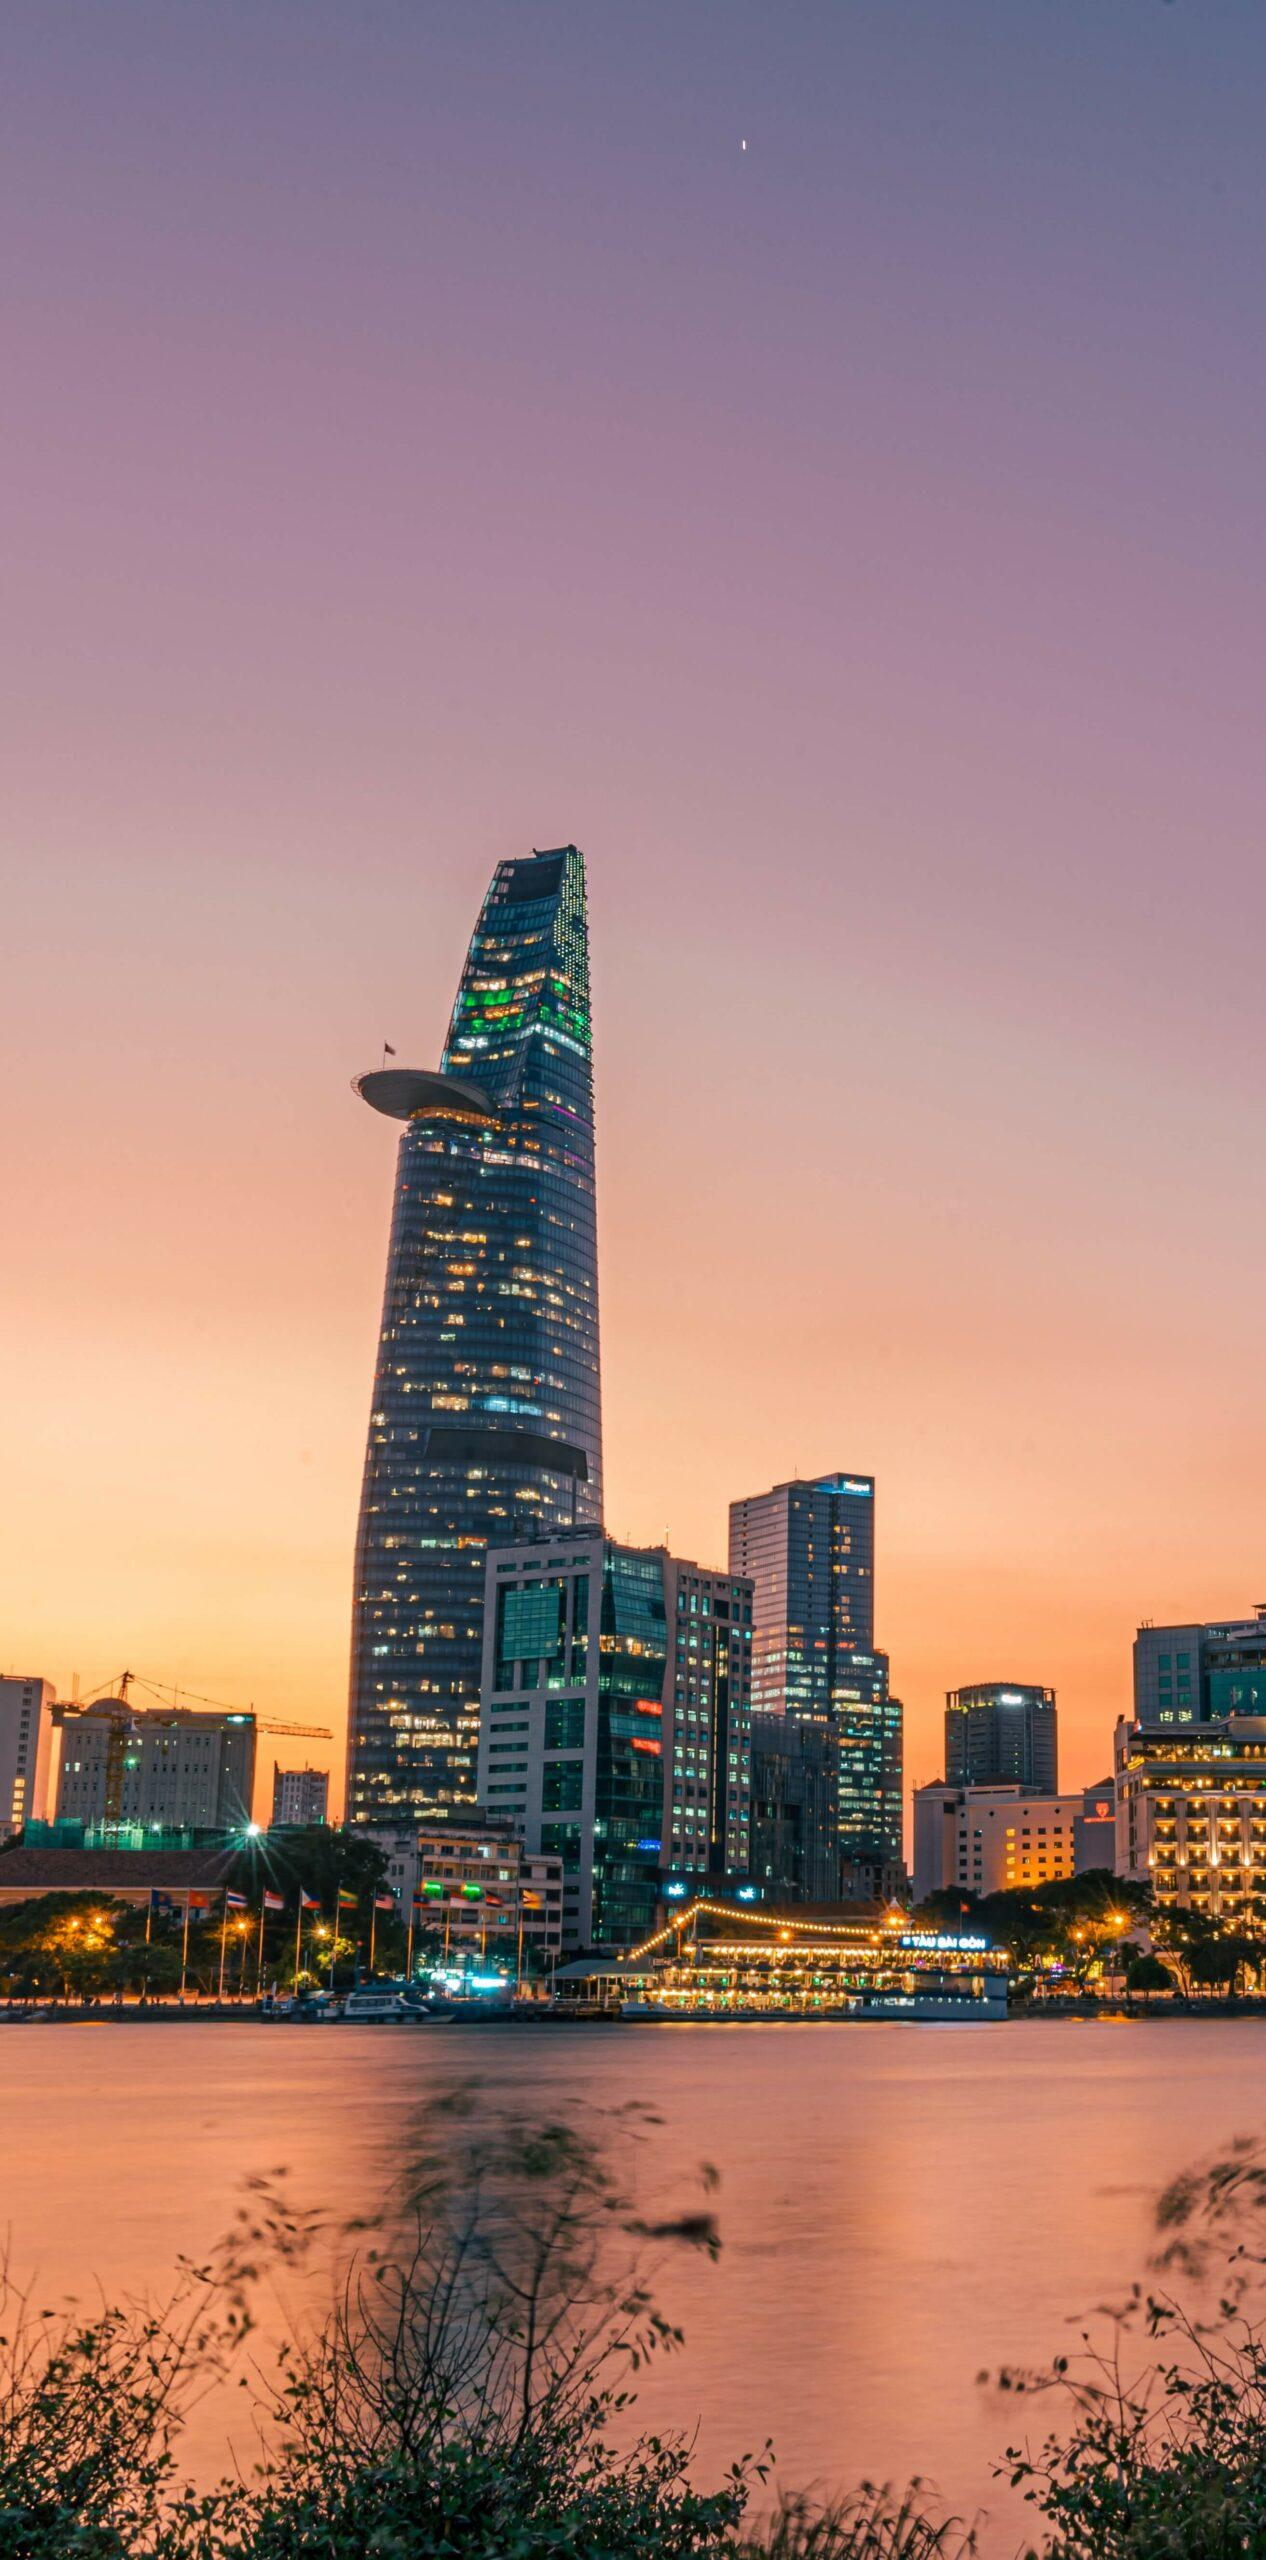 Sparx* - Ho Chi Minh City